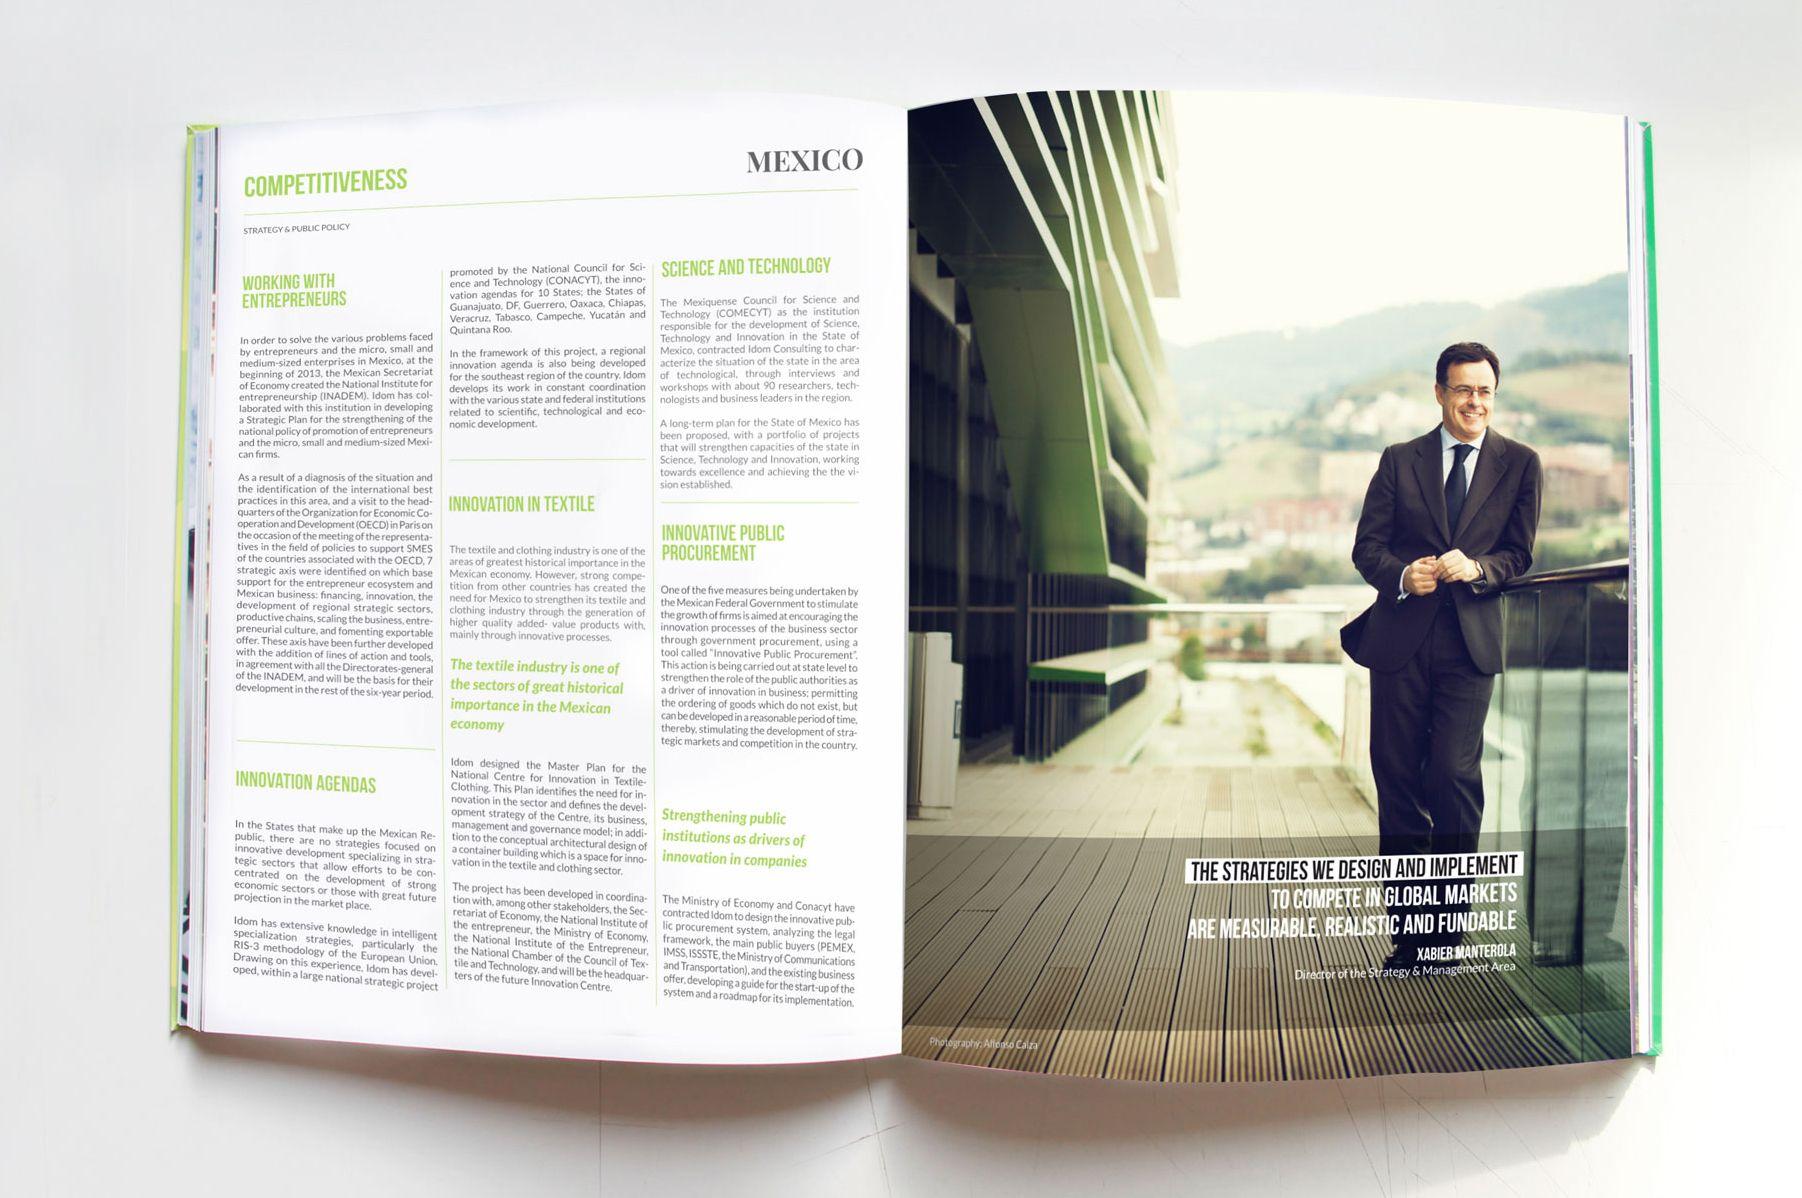 Idom Annual report 2014 designed by Muak Studio www.muak.cc/